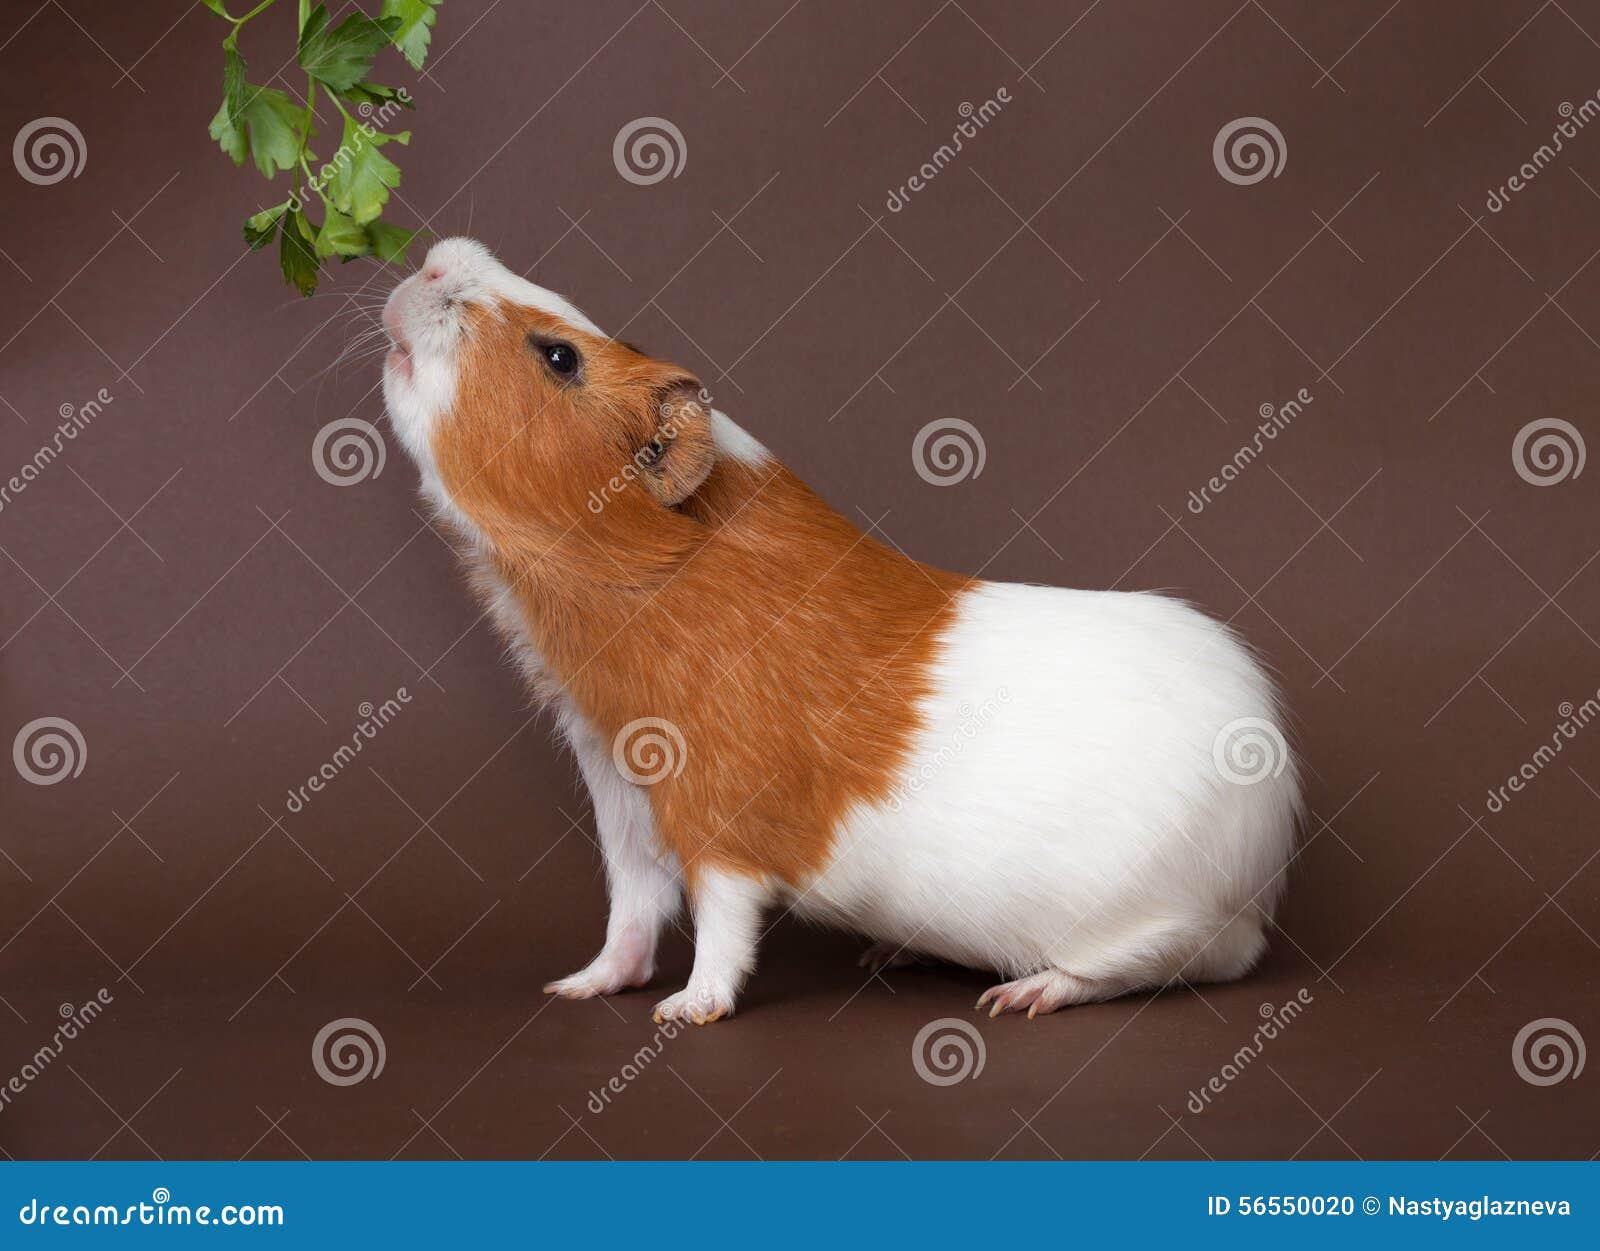 Download Το ινδικό χοιρίδιο μυρίζει Verdure Στοκ Εικόνες - εικόνα από κατανάλωση, γούνα: 56550020